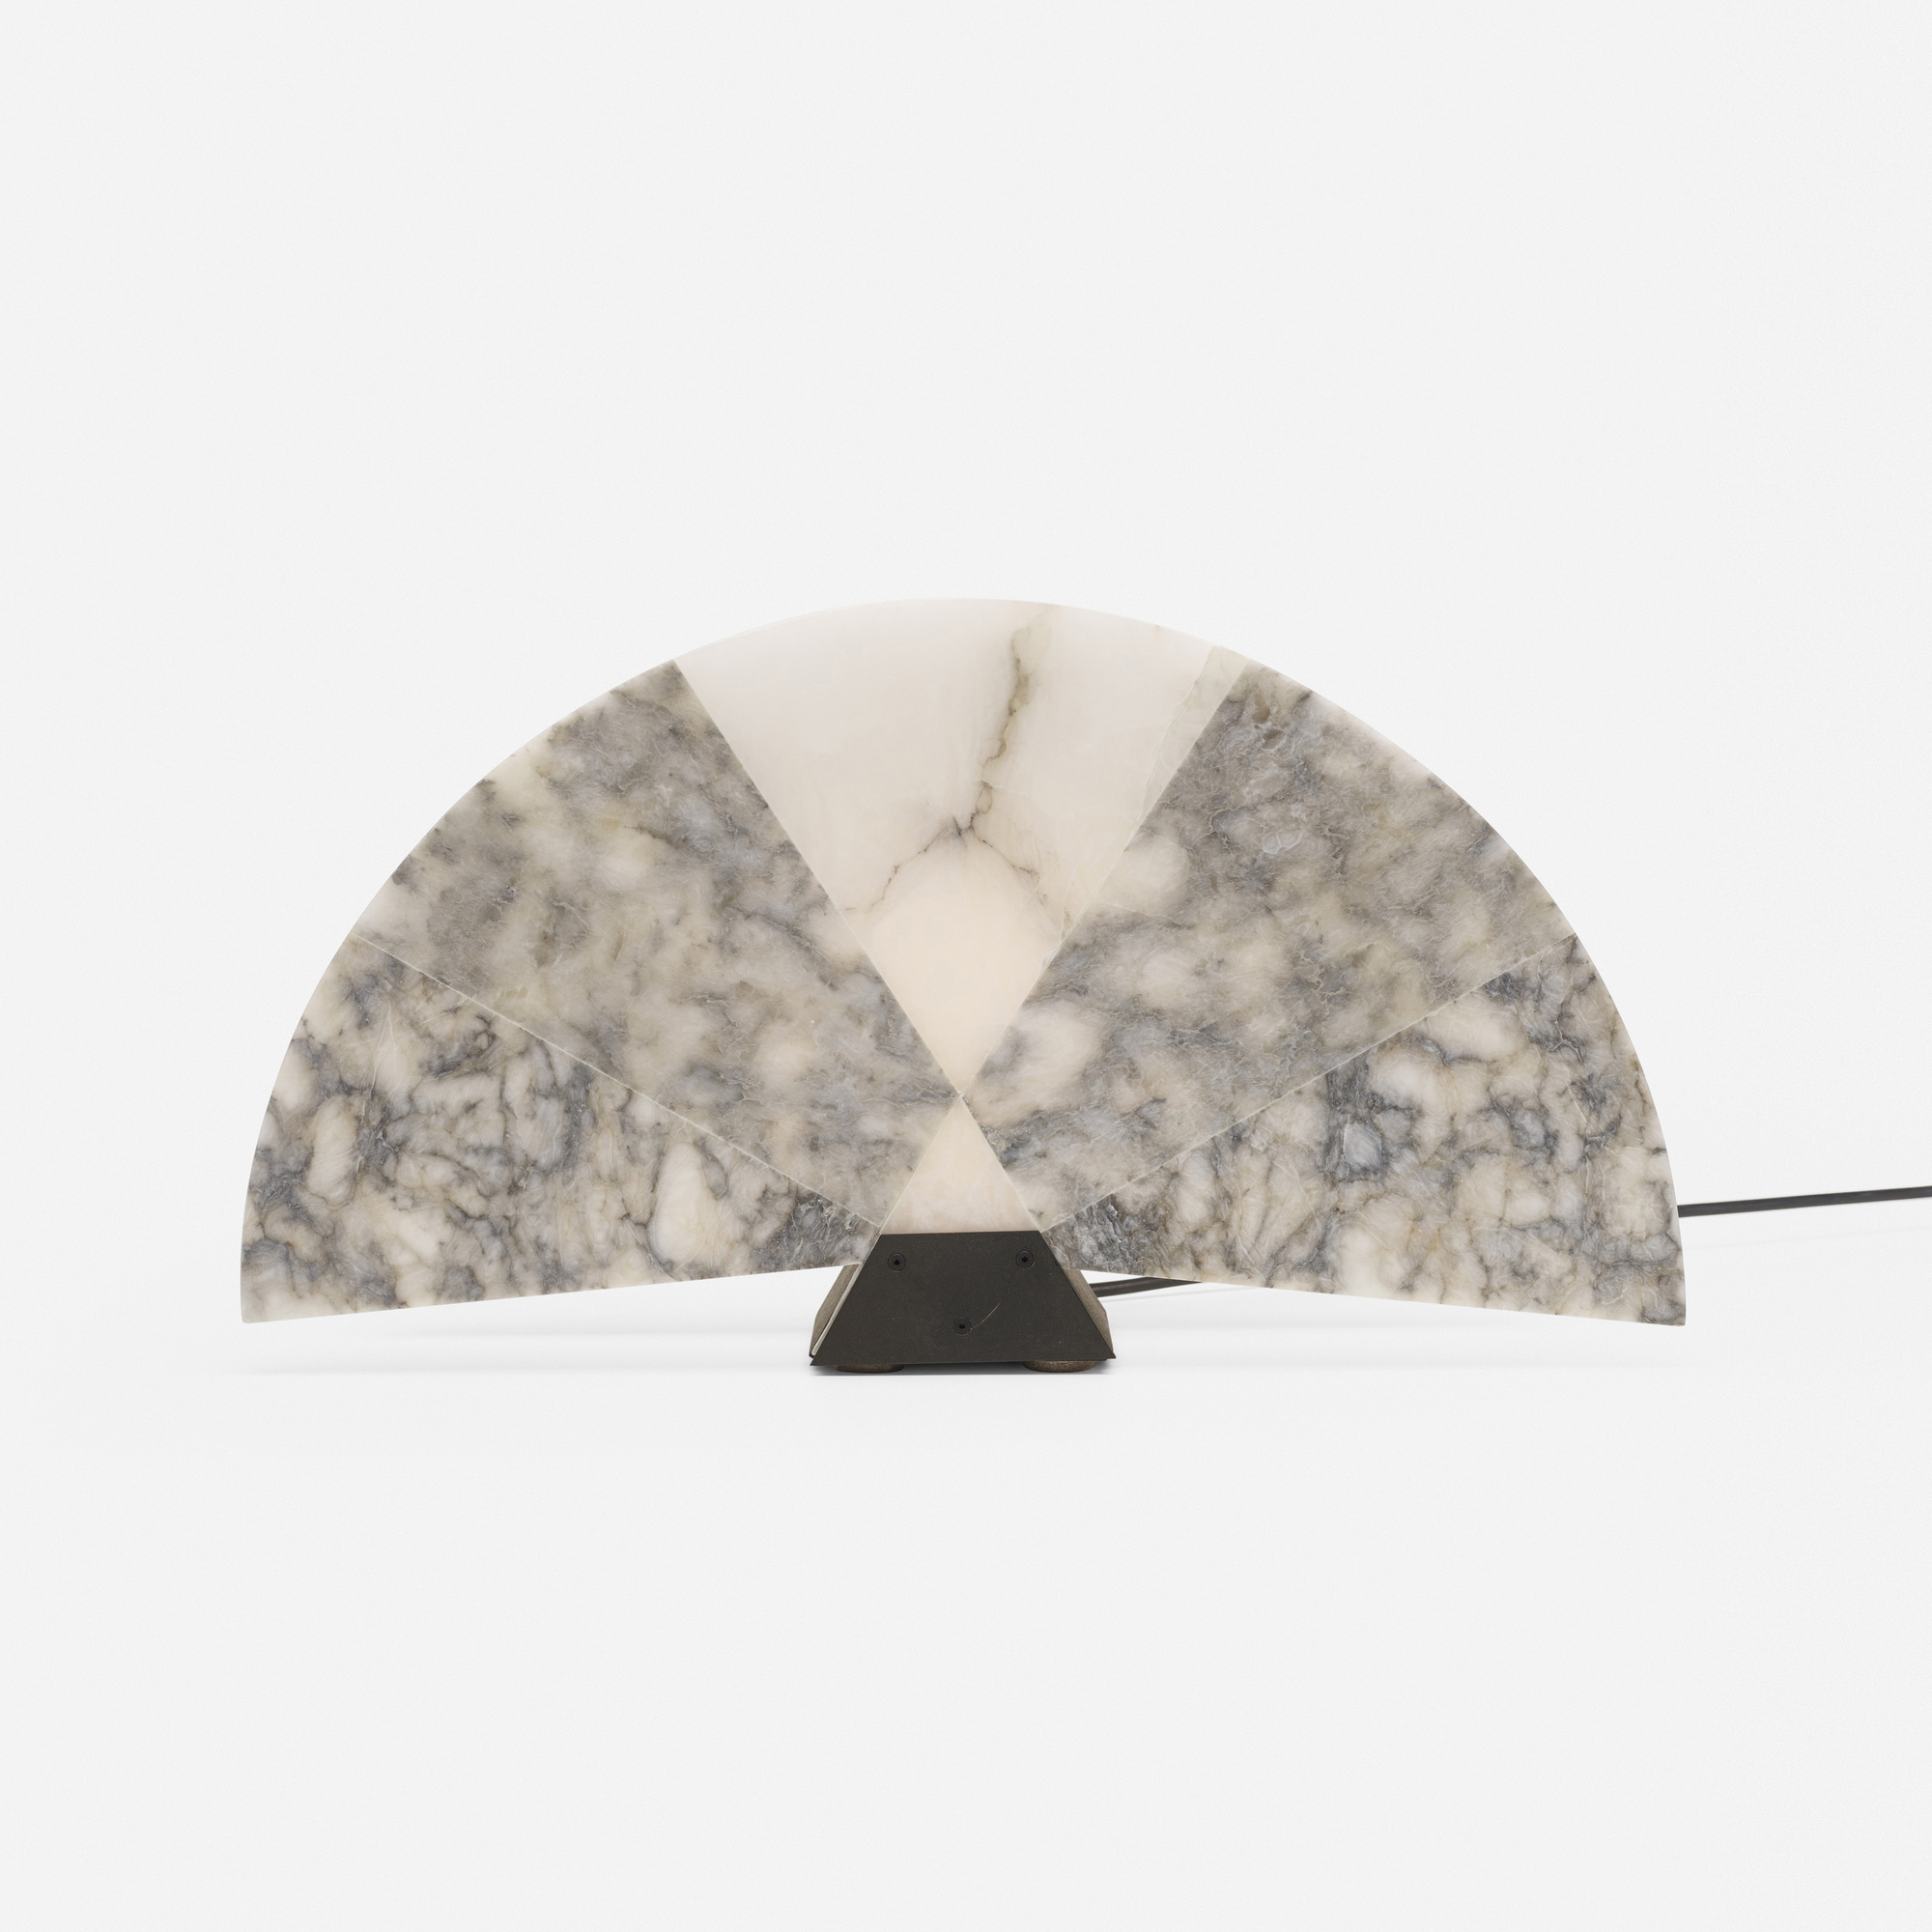 520: Angelo Mangiarotti / Ventiglio table lamp, model V584 (1 of 1)